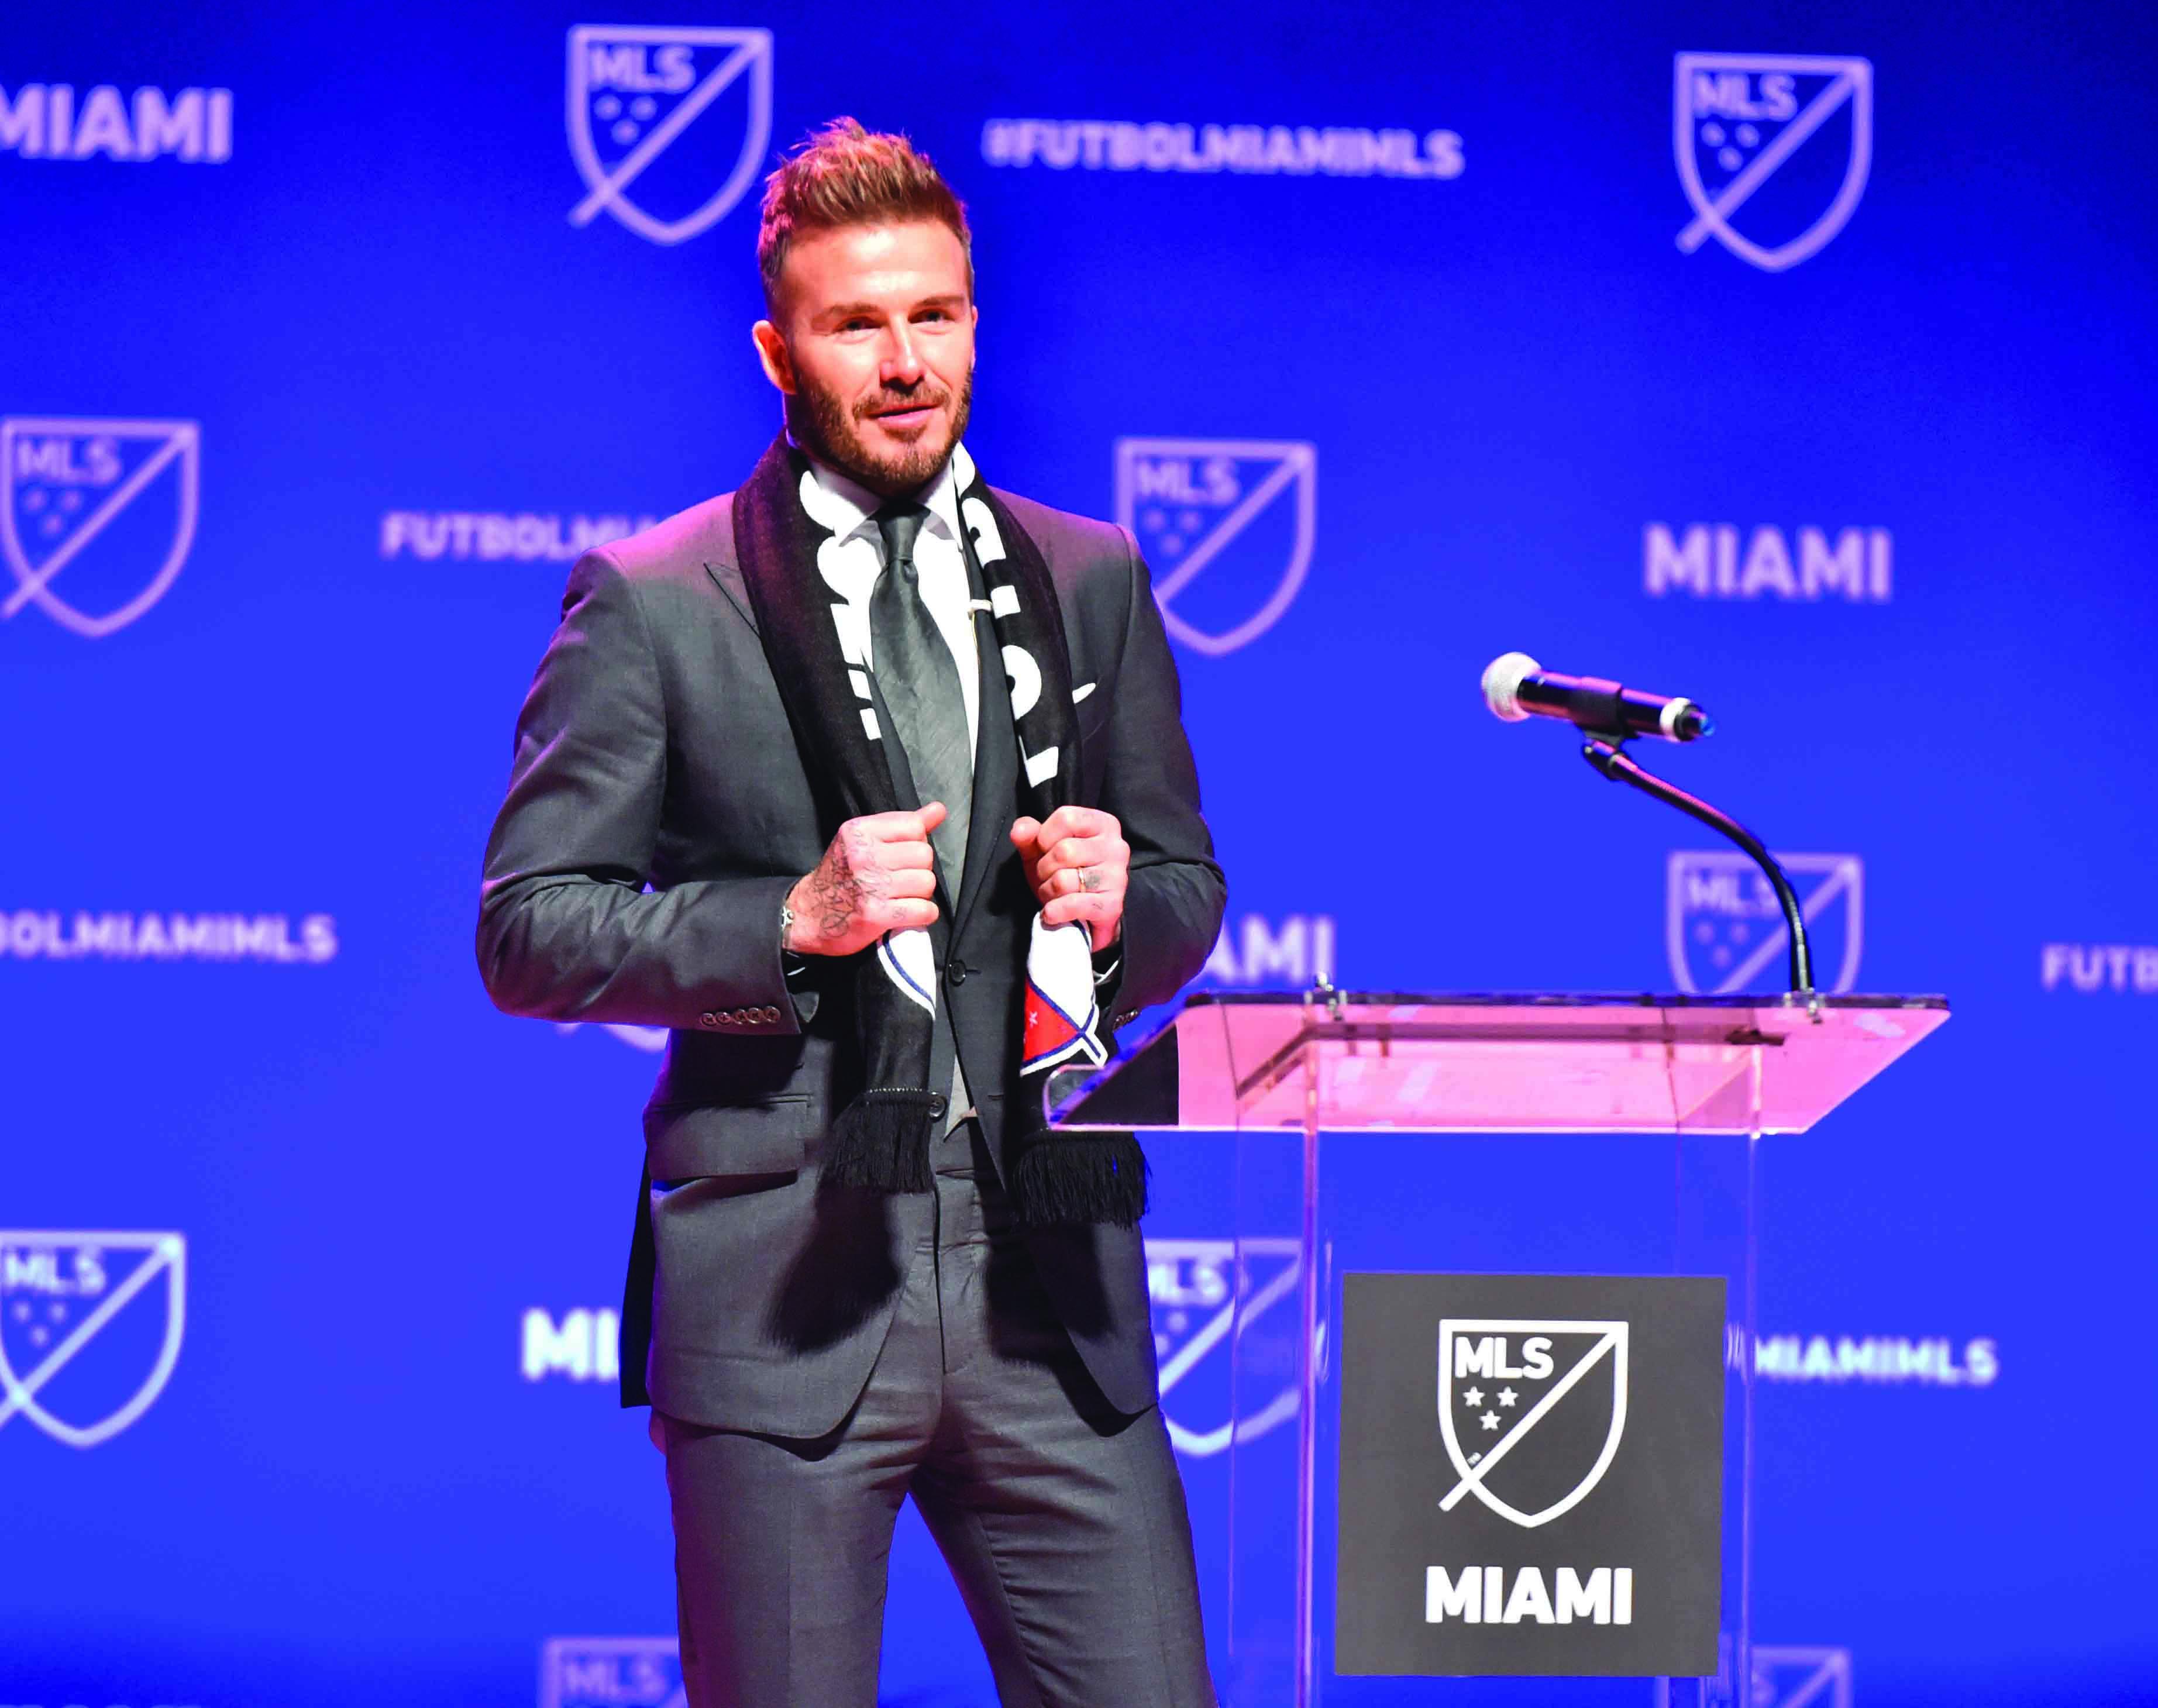 David Beckham - Miami